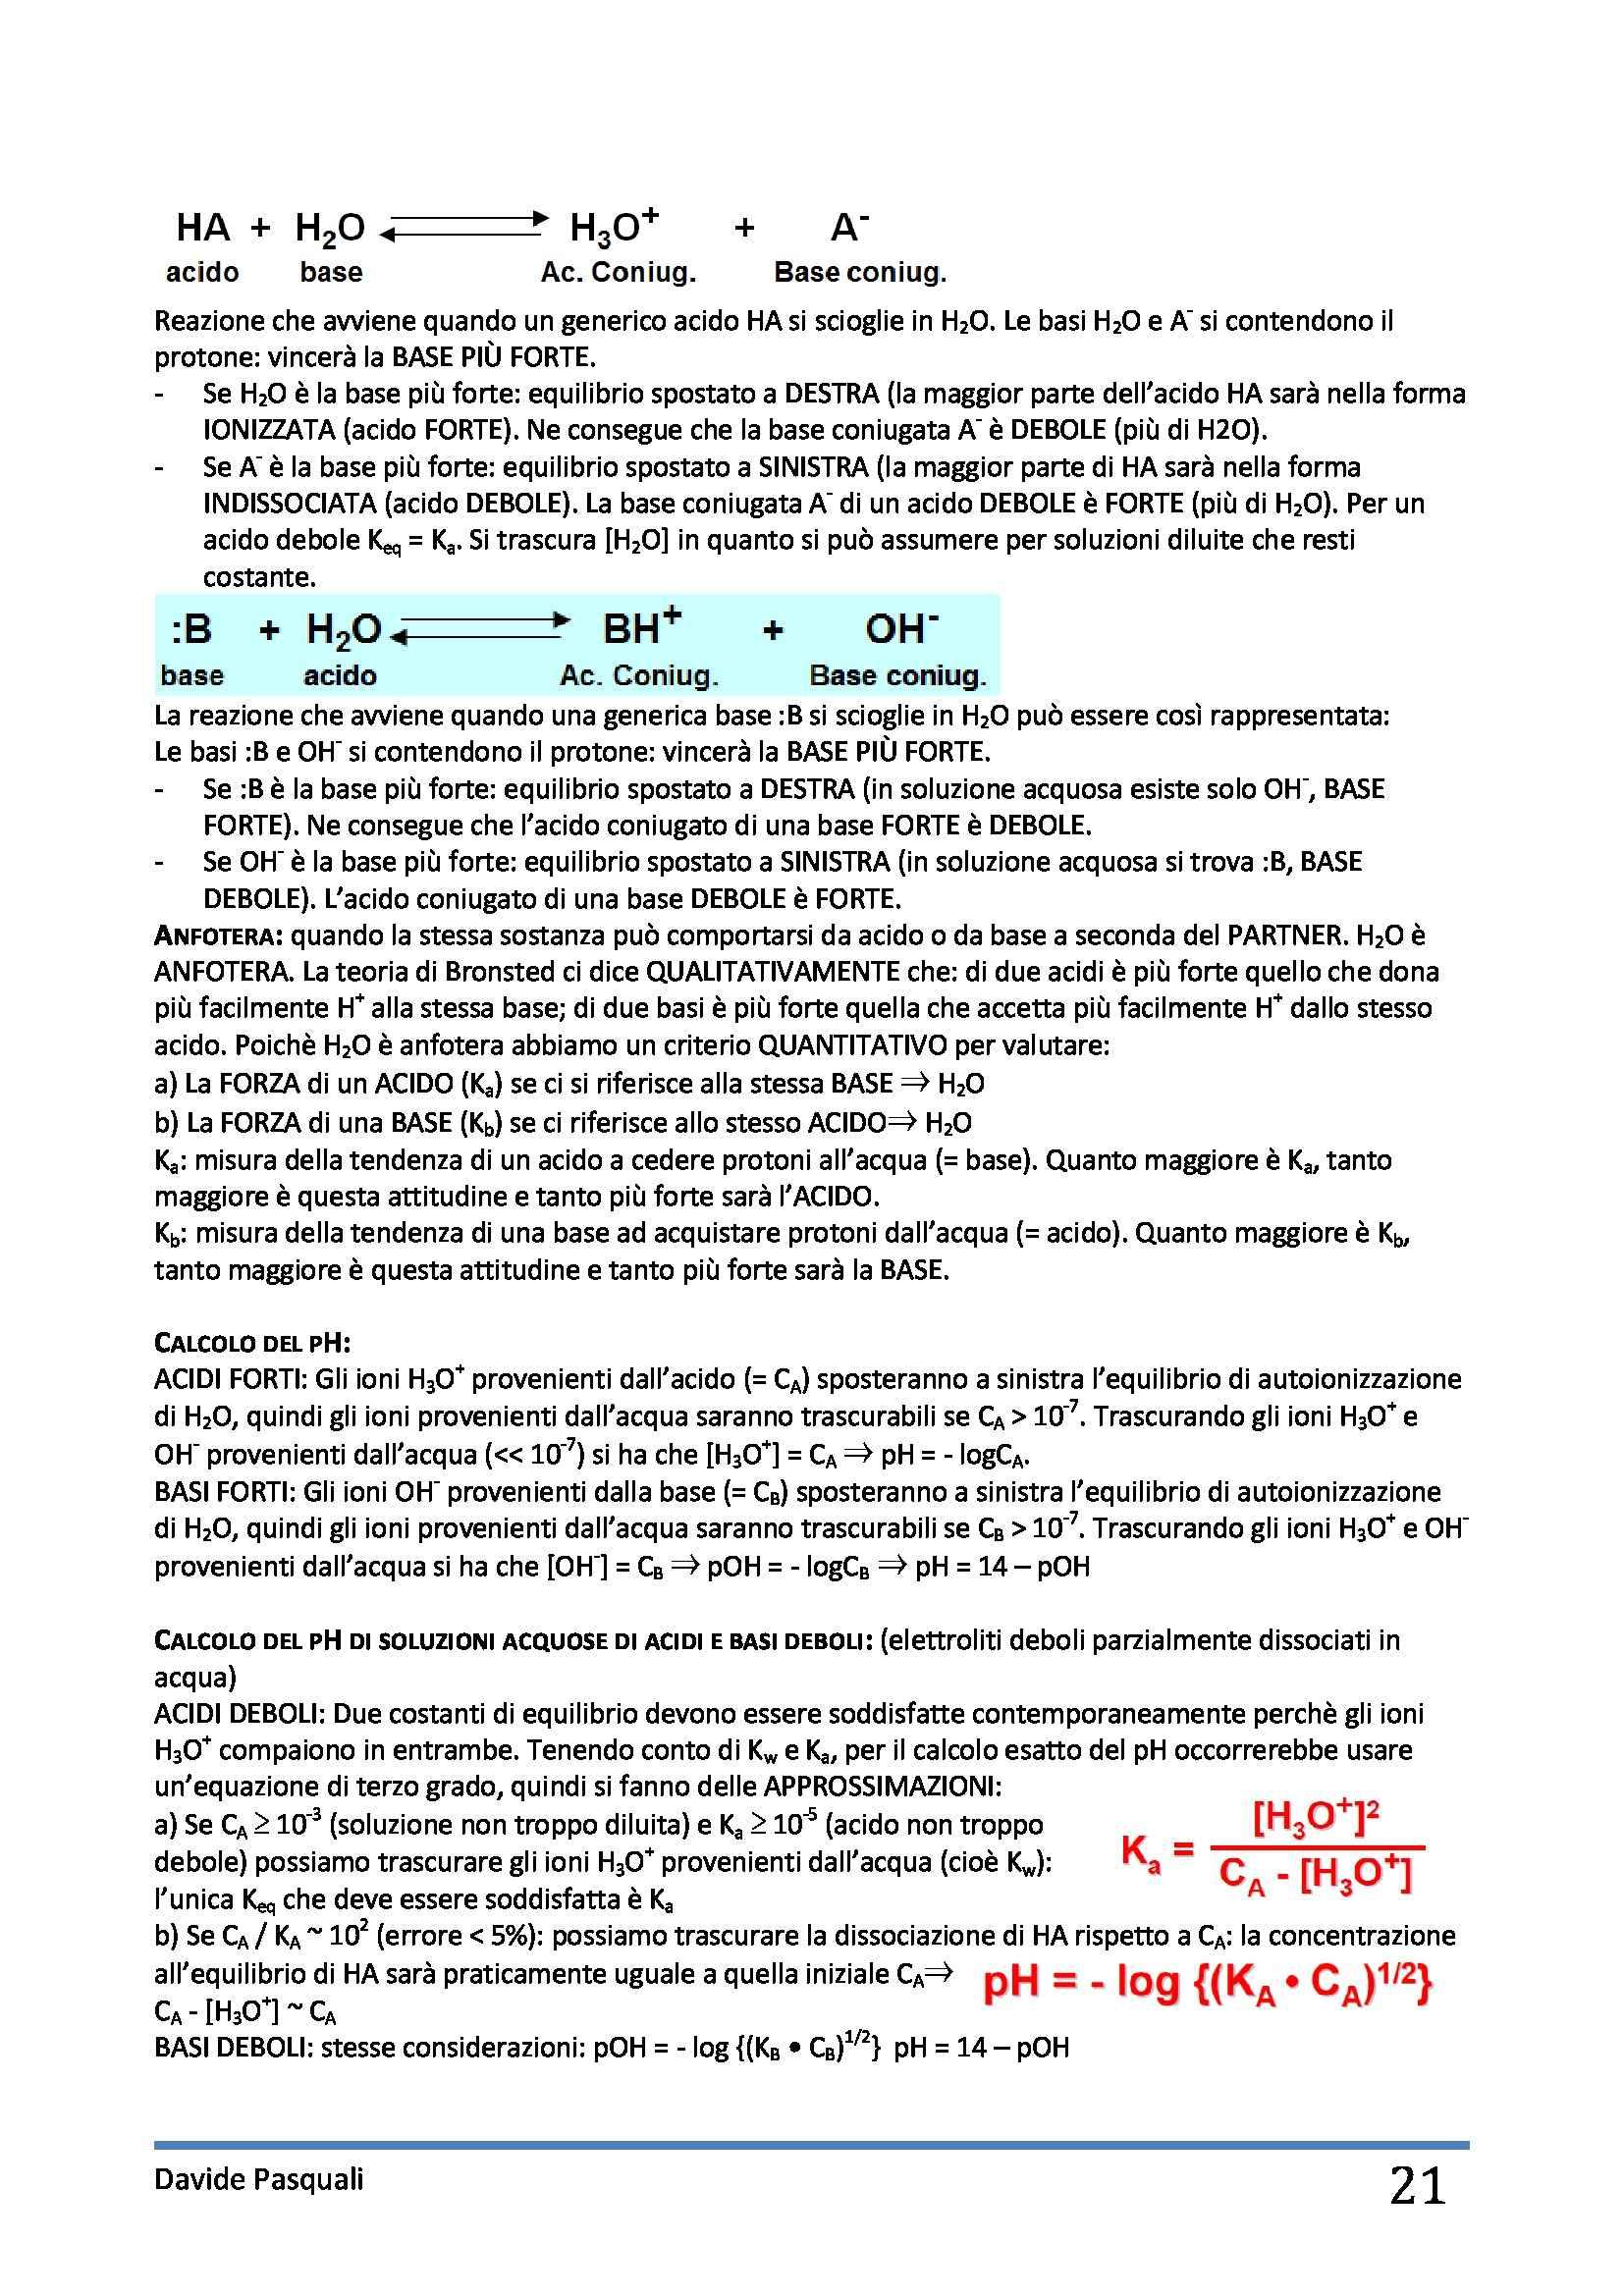 Fondamenti di chimica  - Appunti Pag. 21